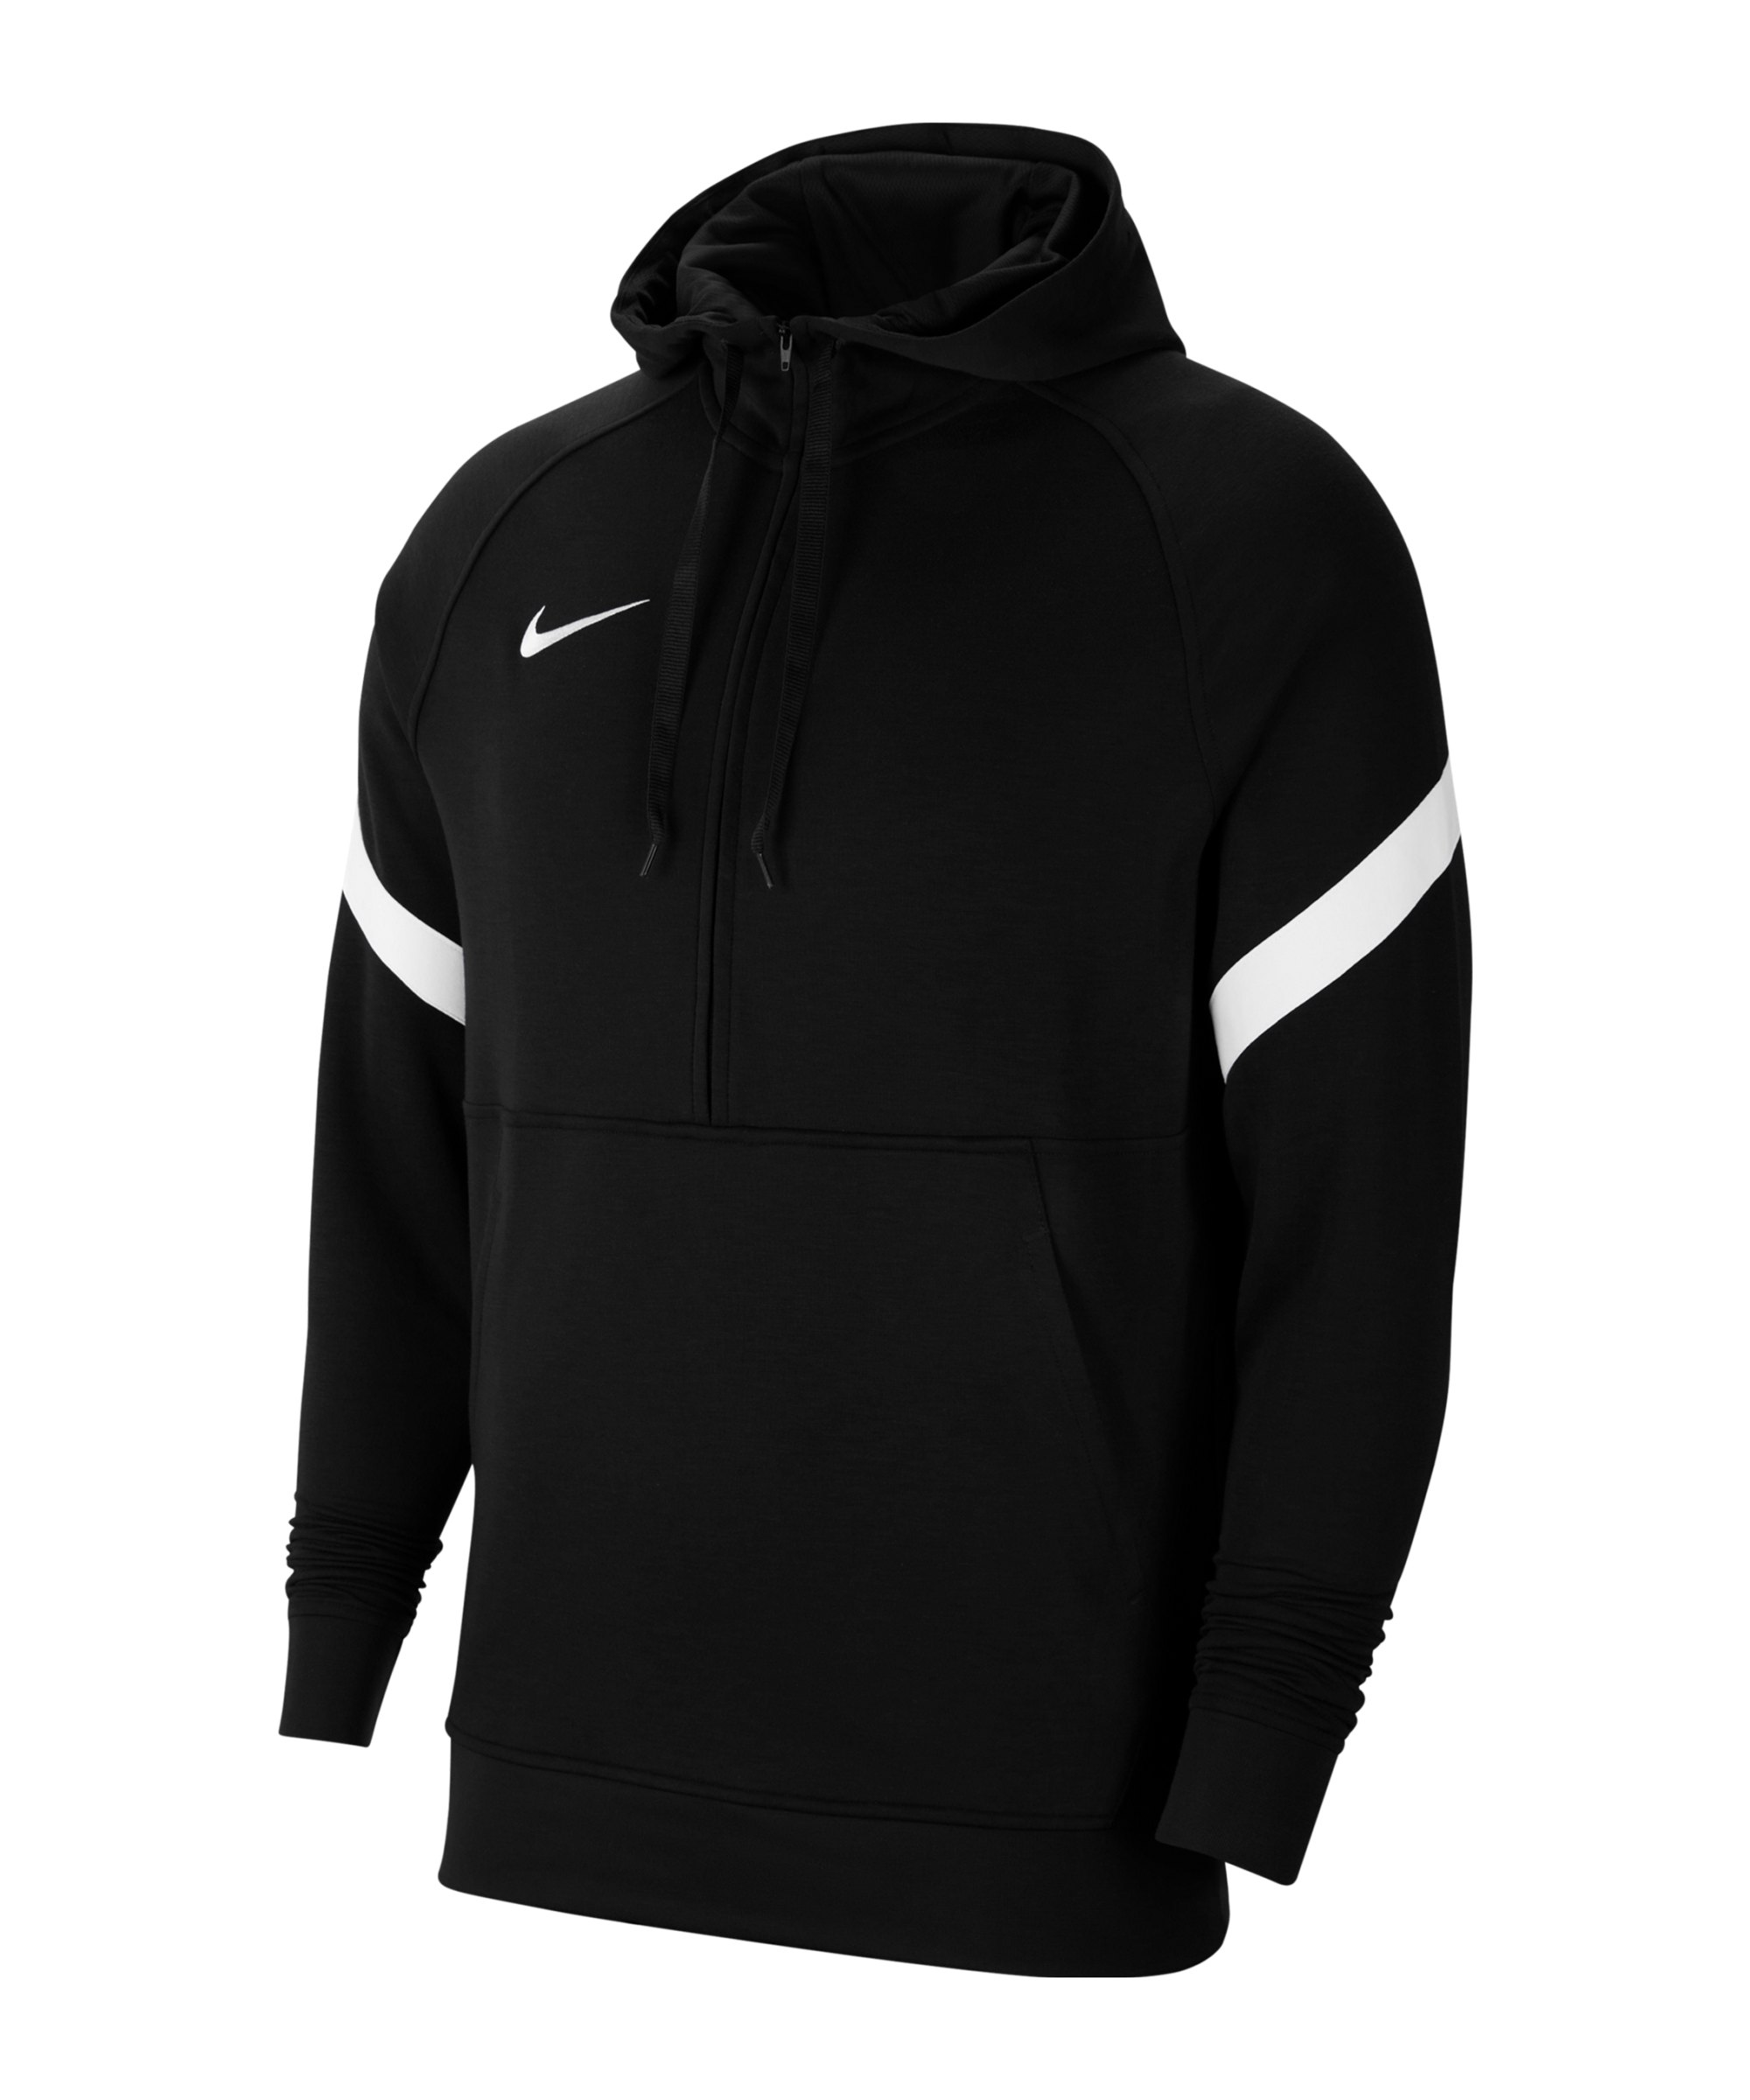 Nike Strike 21 Fleece HalfZip Hoody Schwarz F010 - schwarz